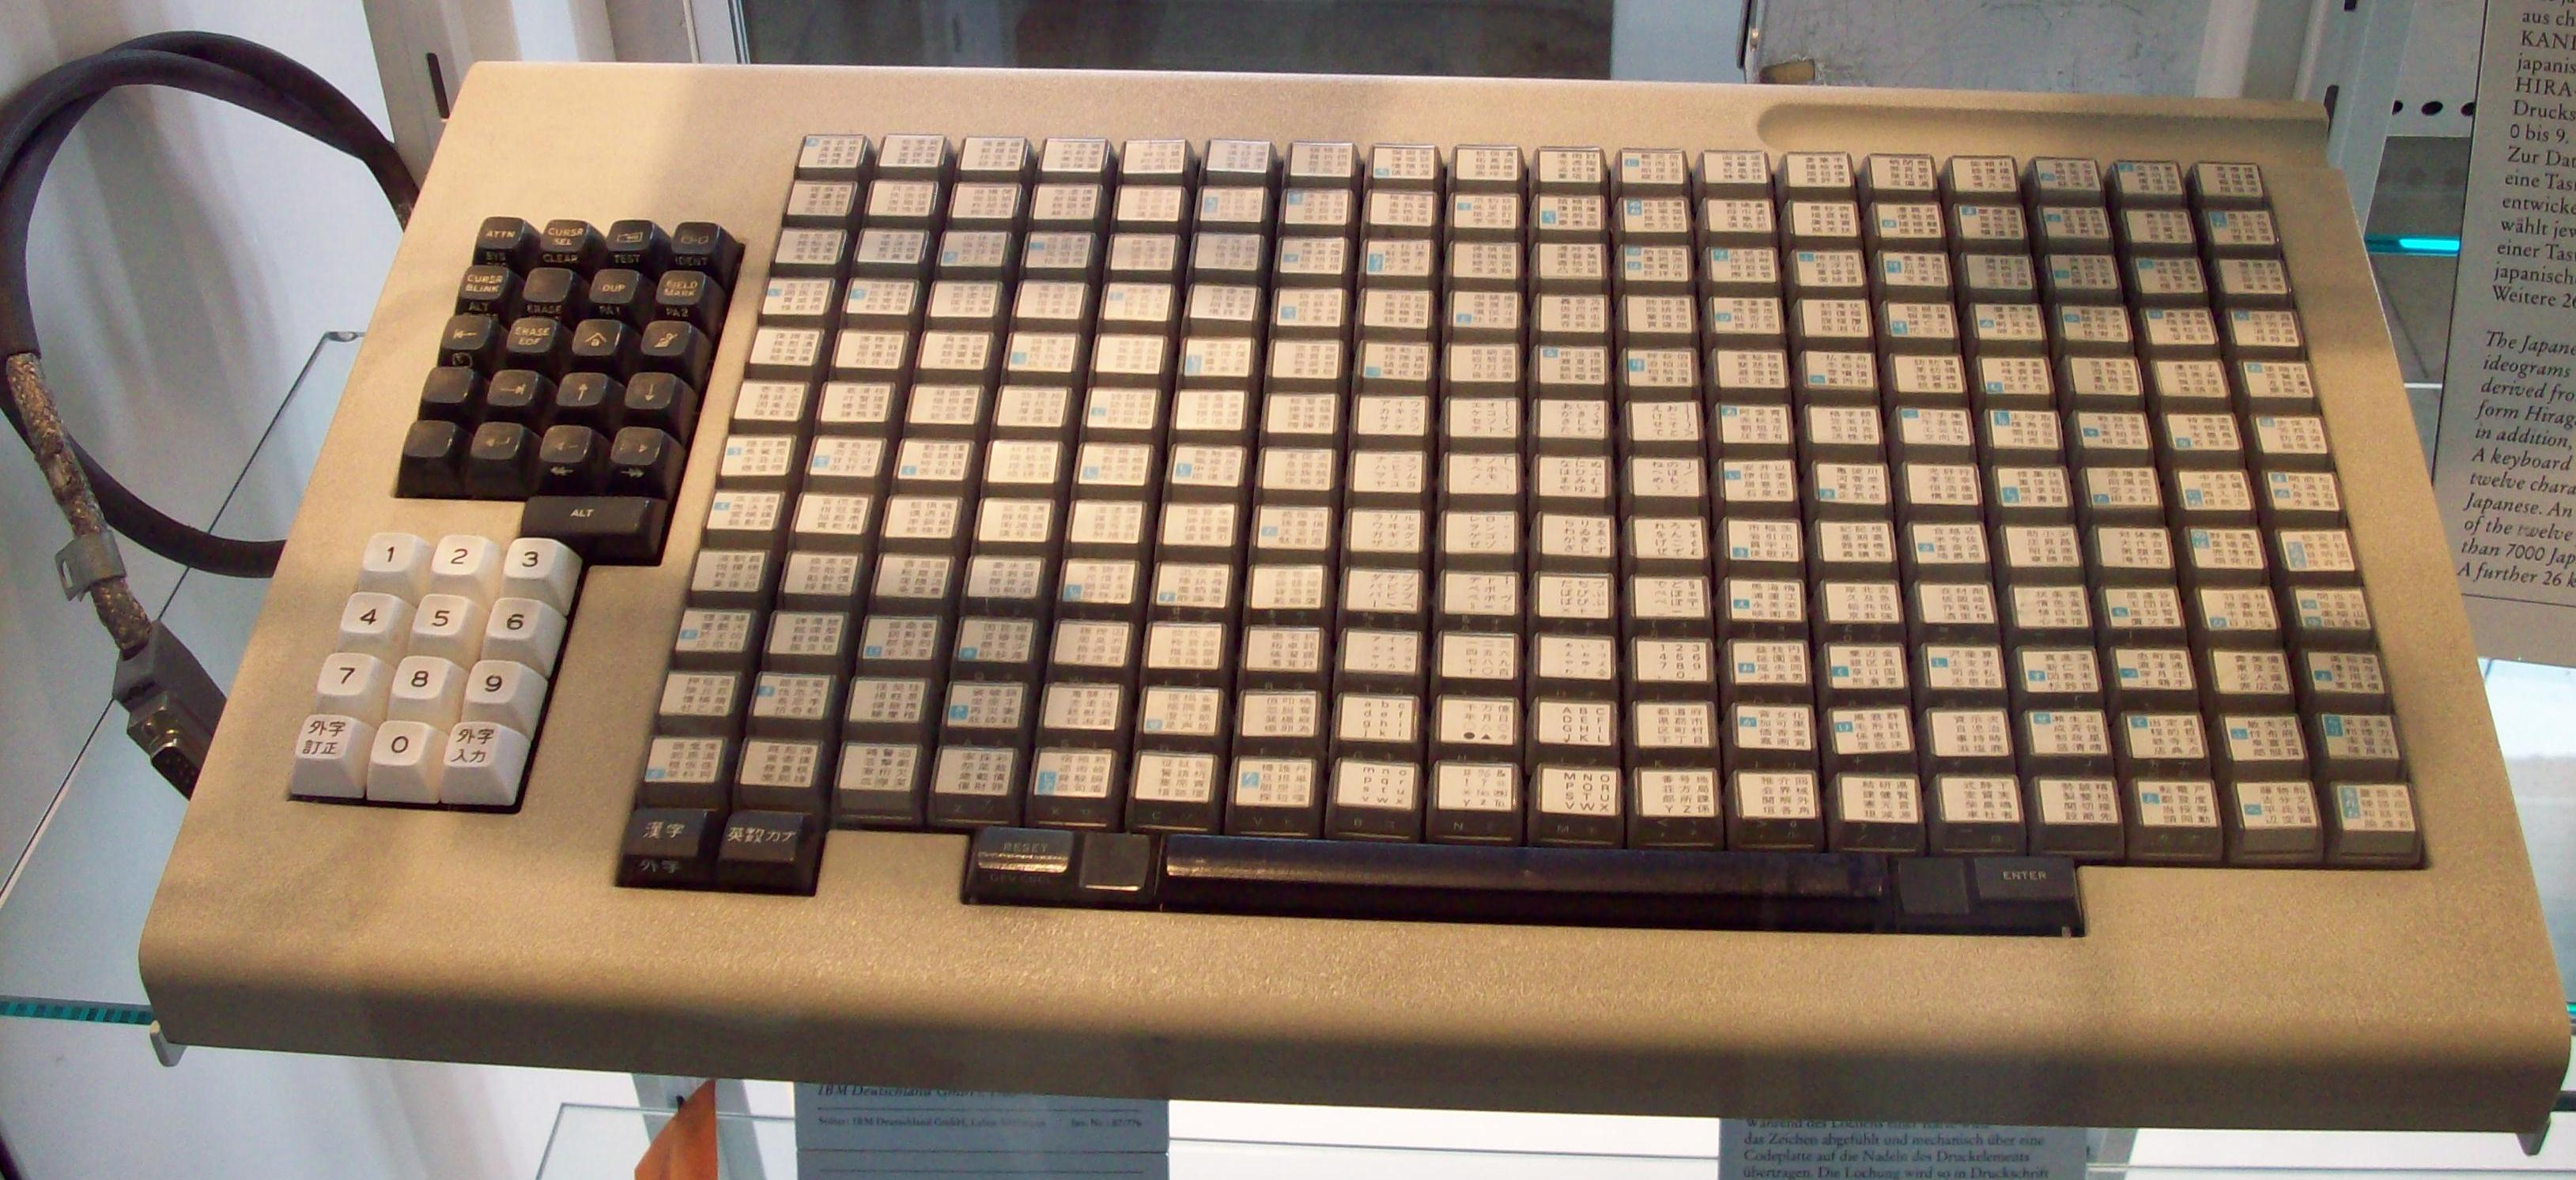 Adesso MCK-142Pro Drivers for Mac